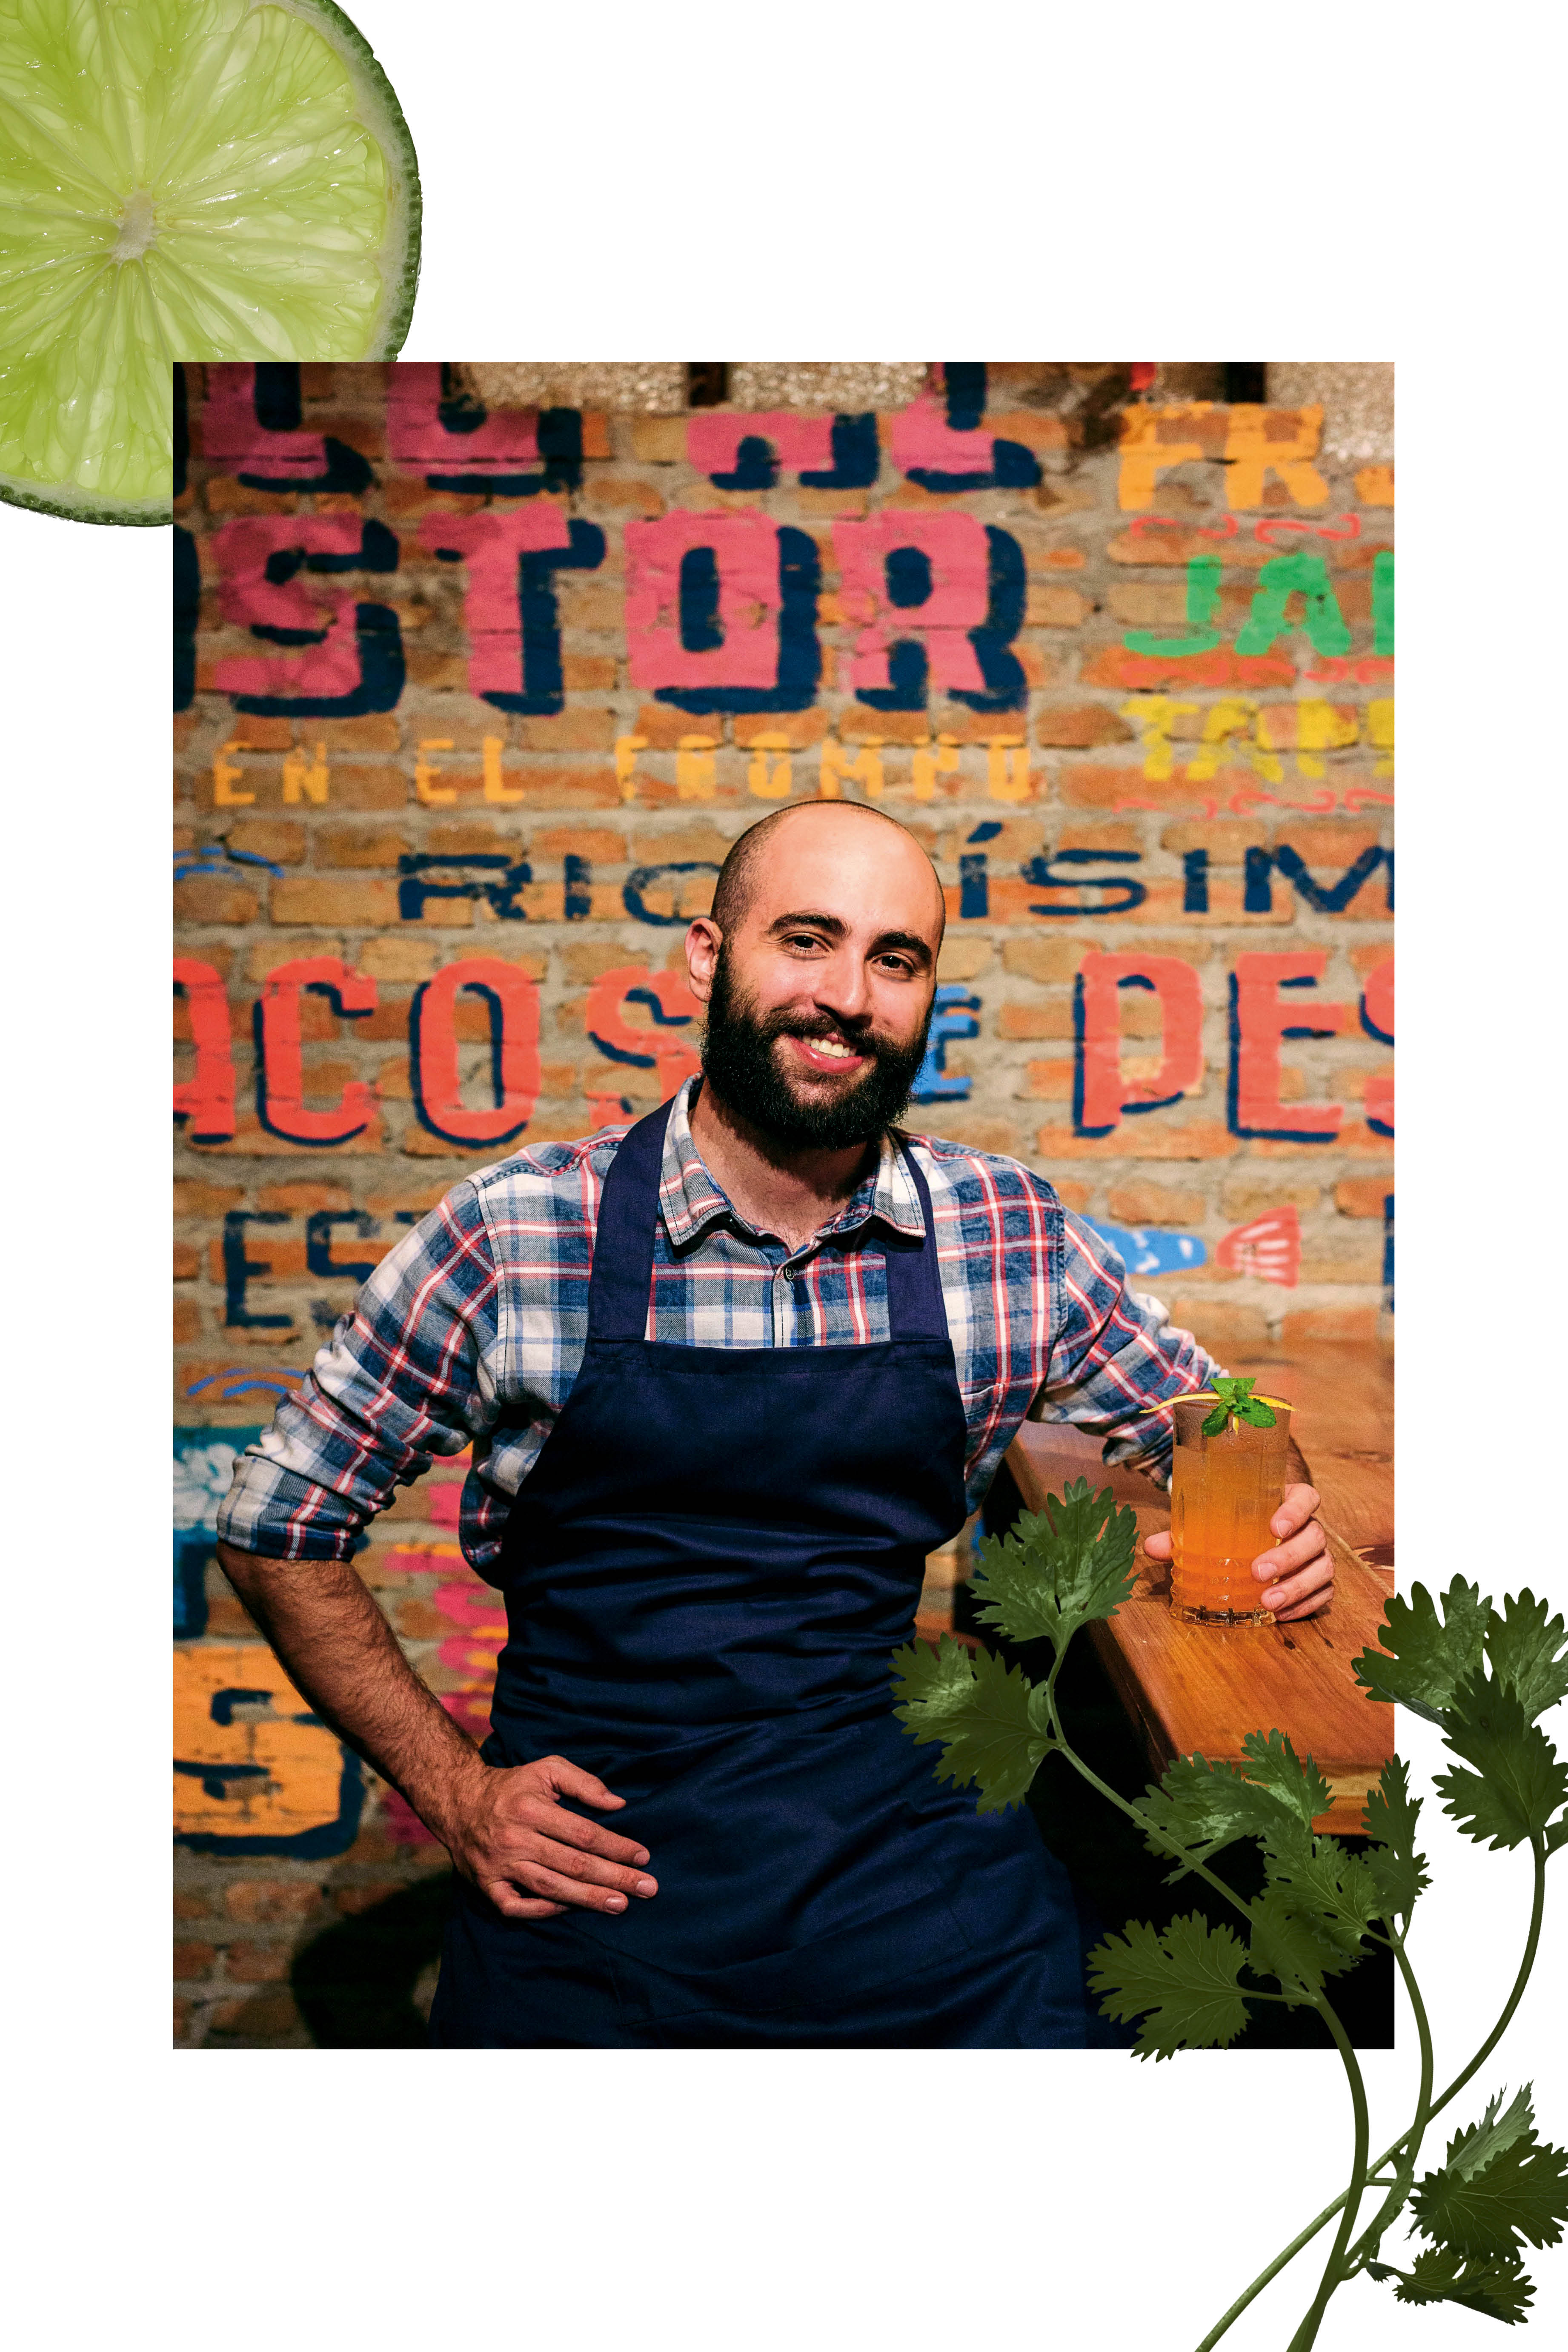 O chef Fernando Gasparetto, do Lupe Bar y Taqueria